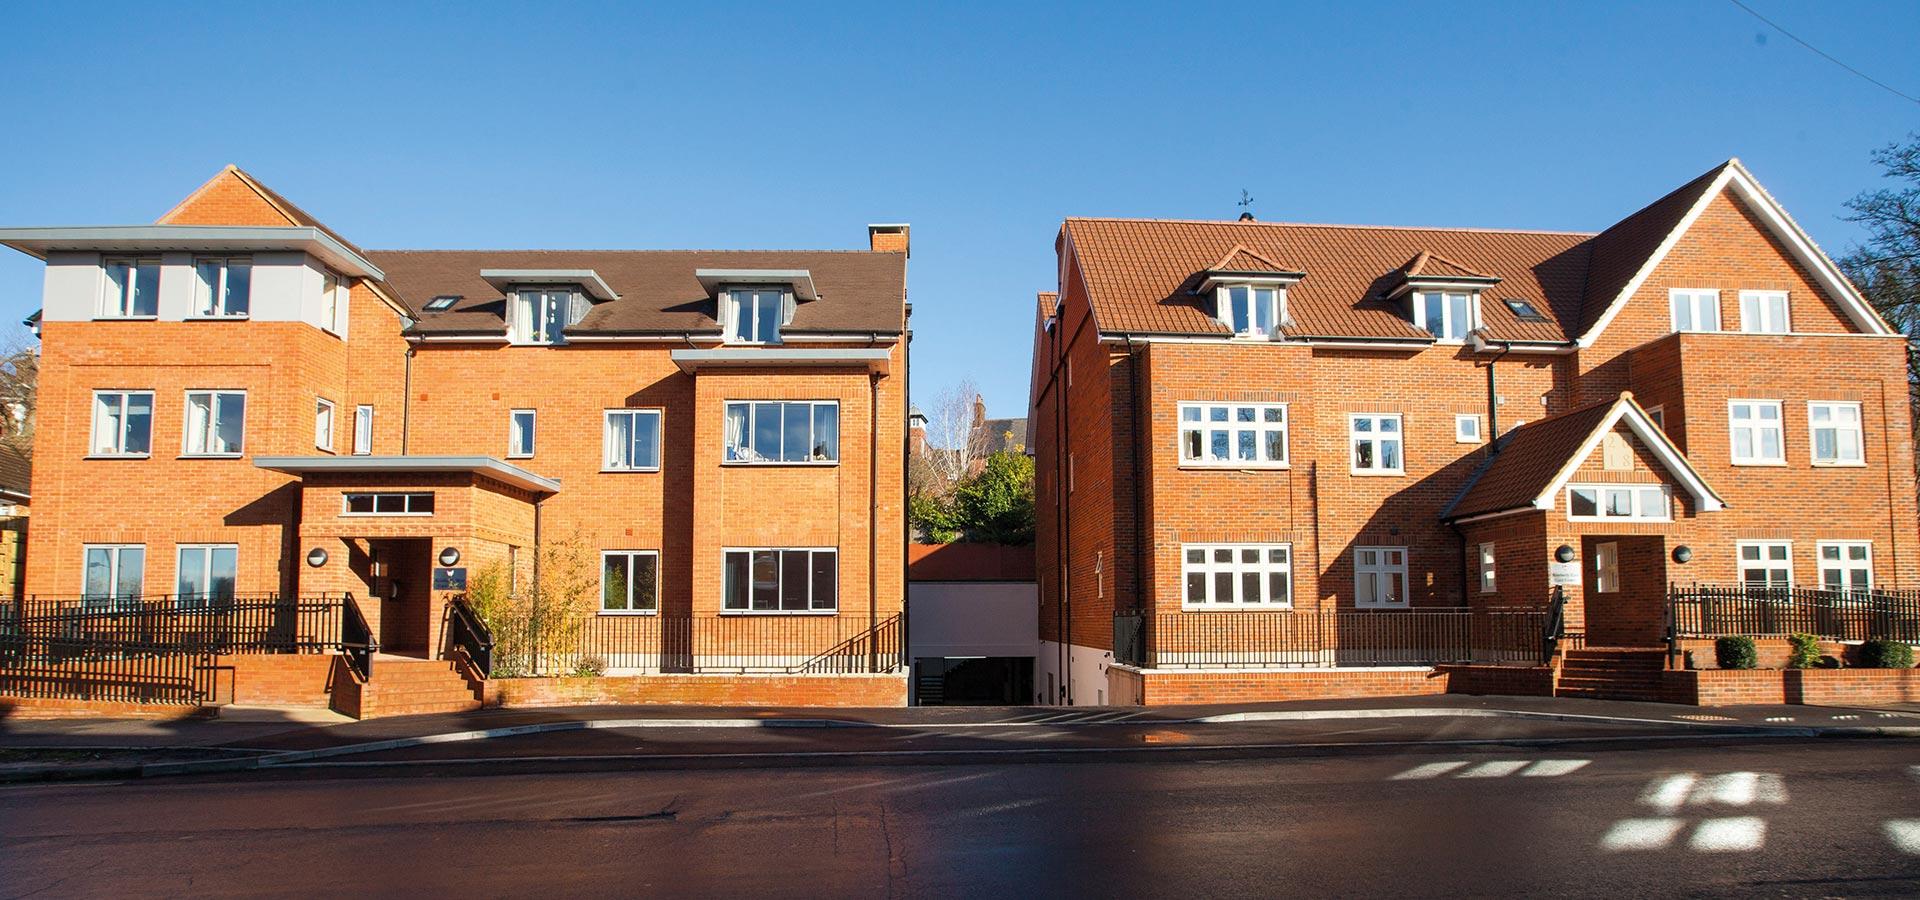 Wessex Care building